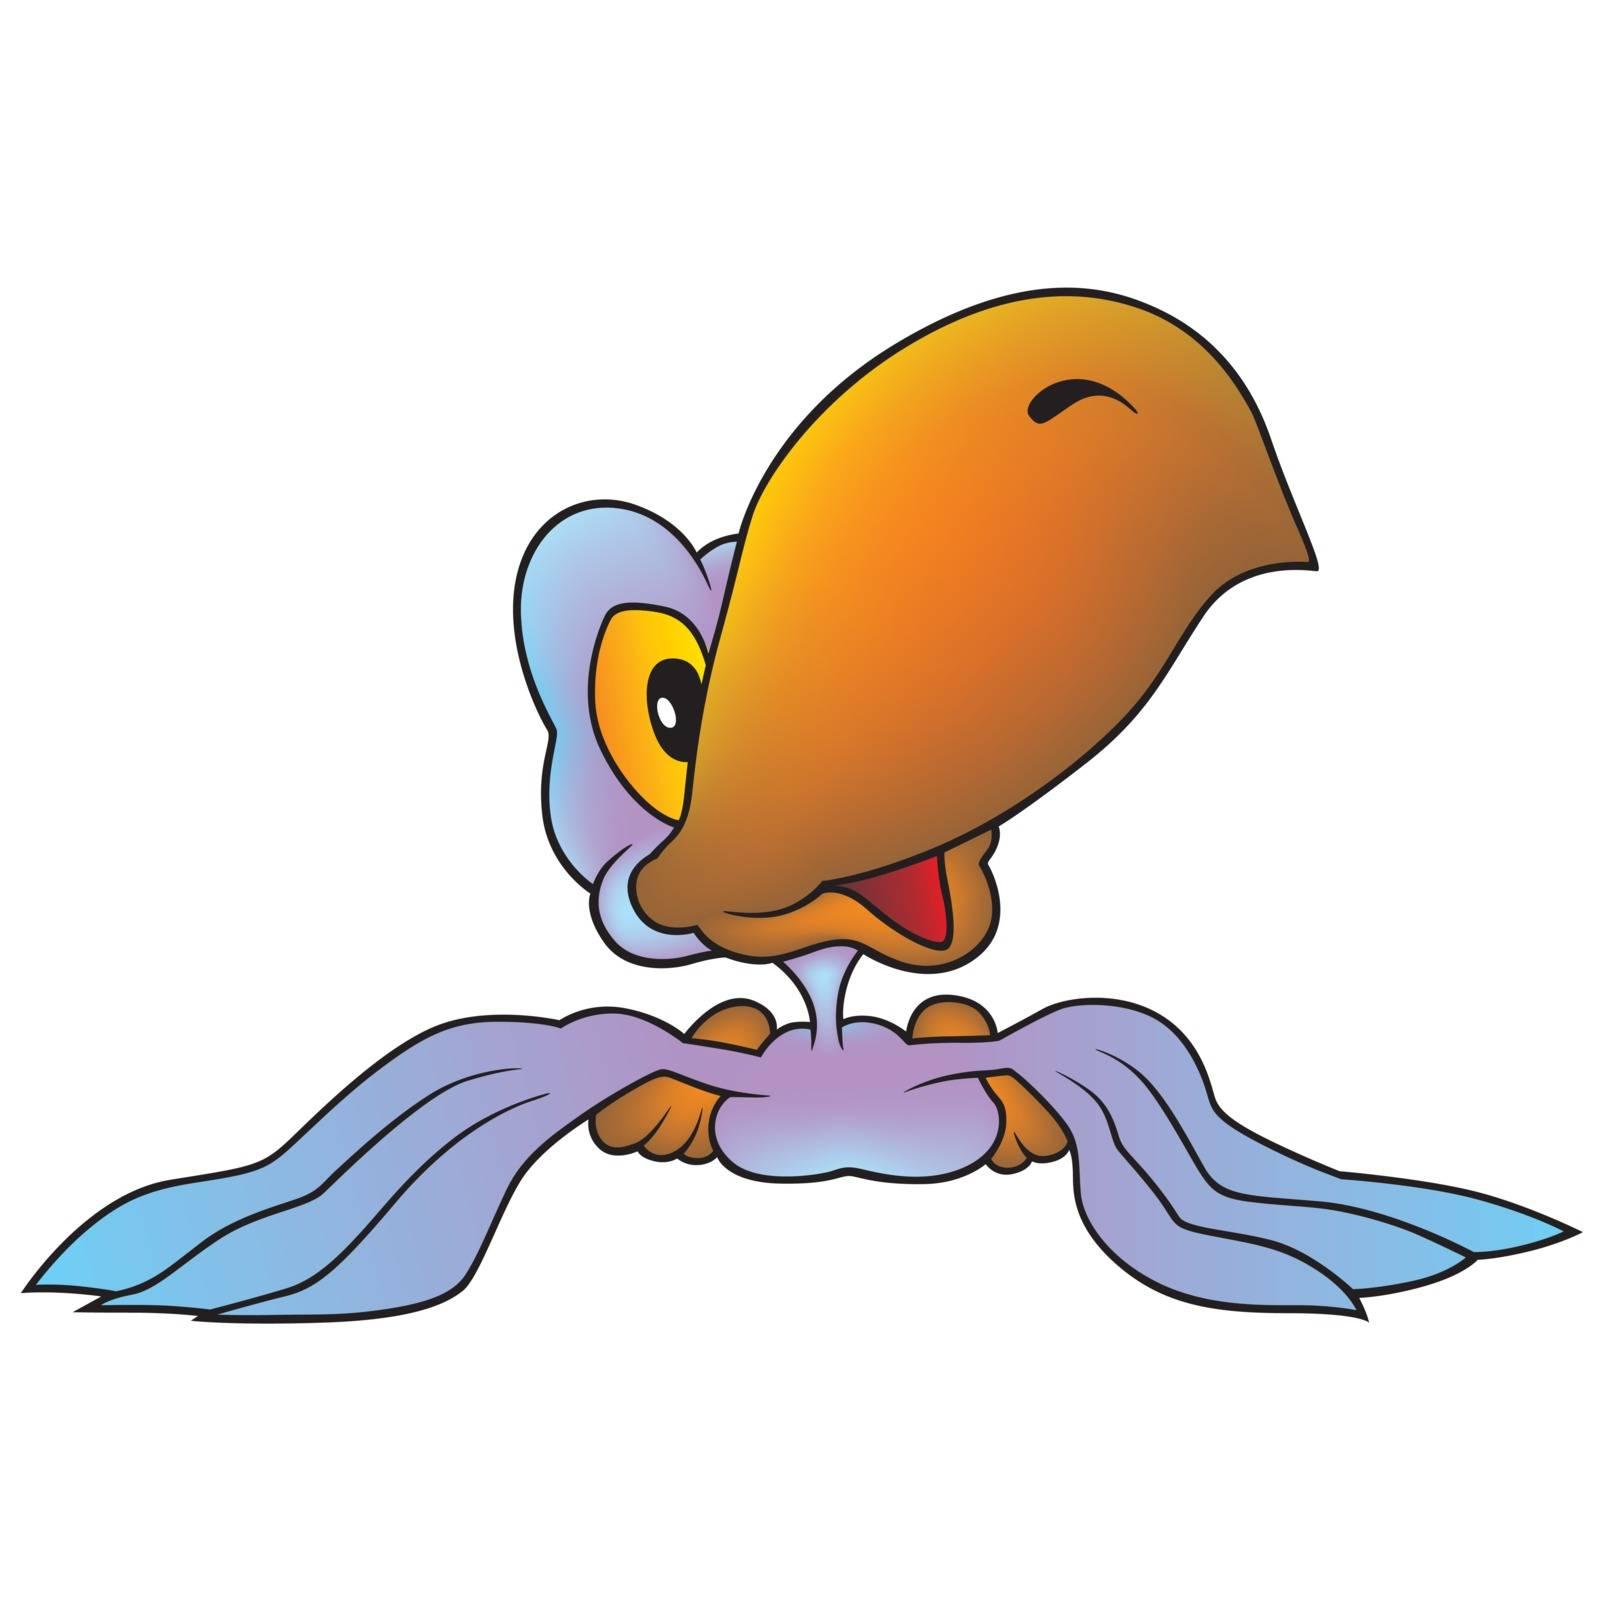 Violet Parrot - Colored Cartoon Illustration, Vector